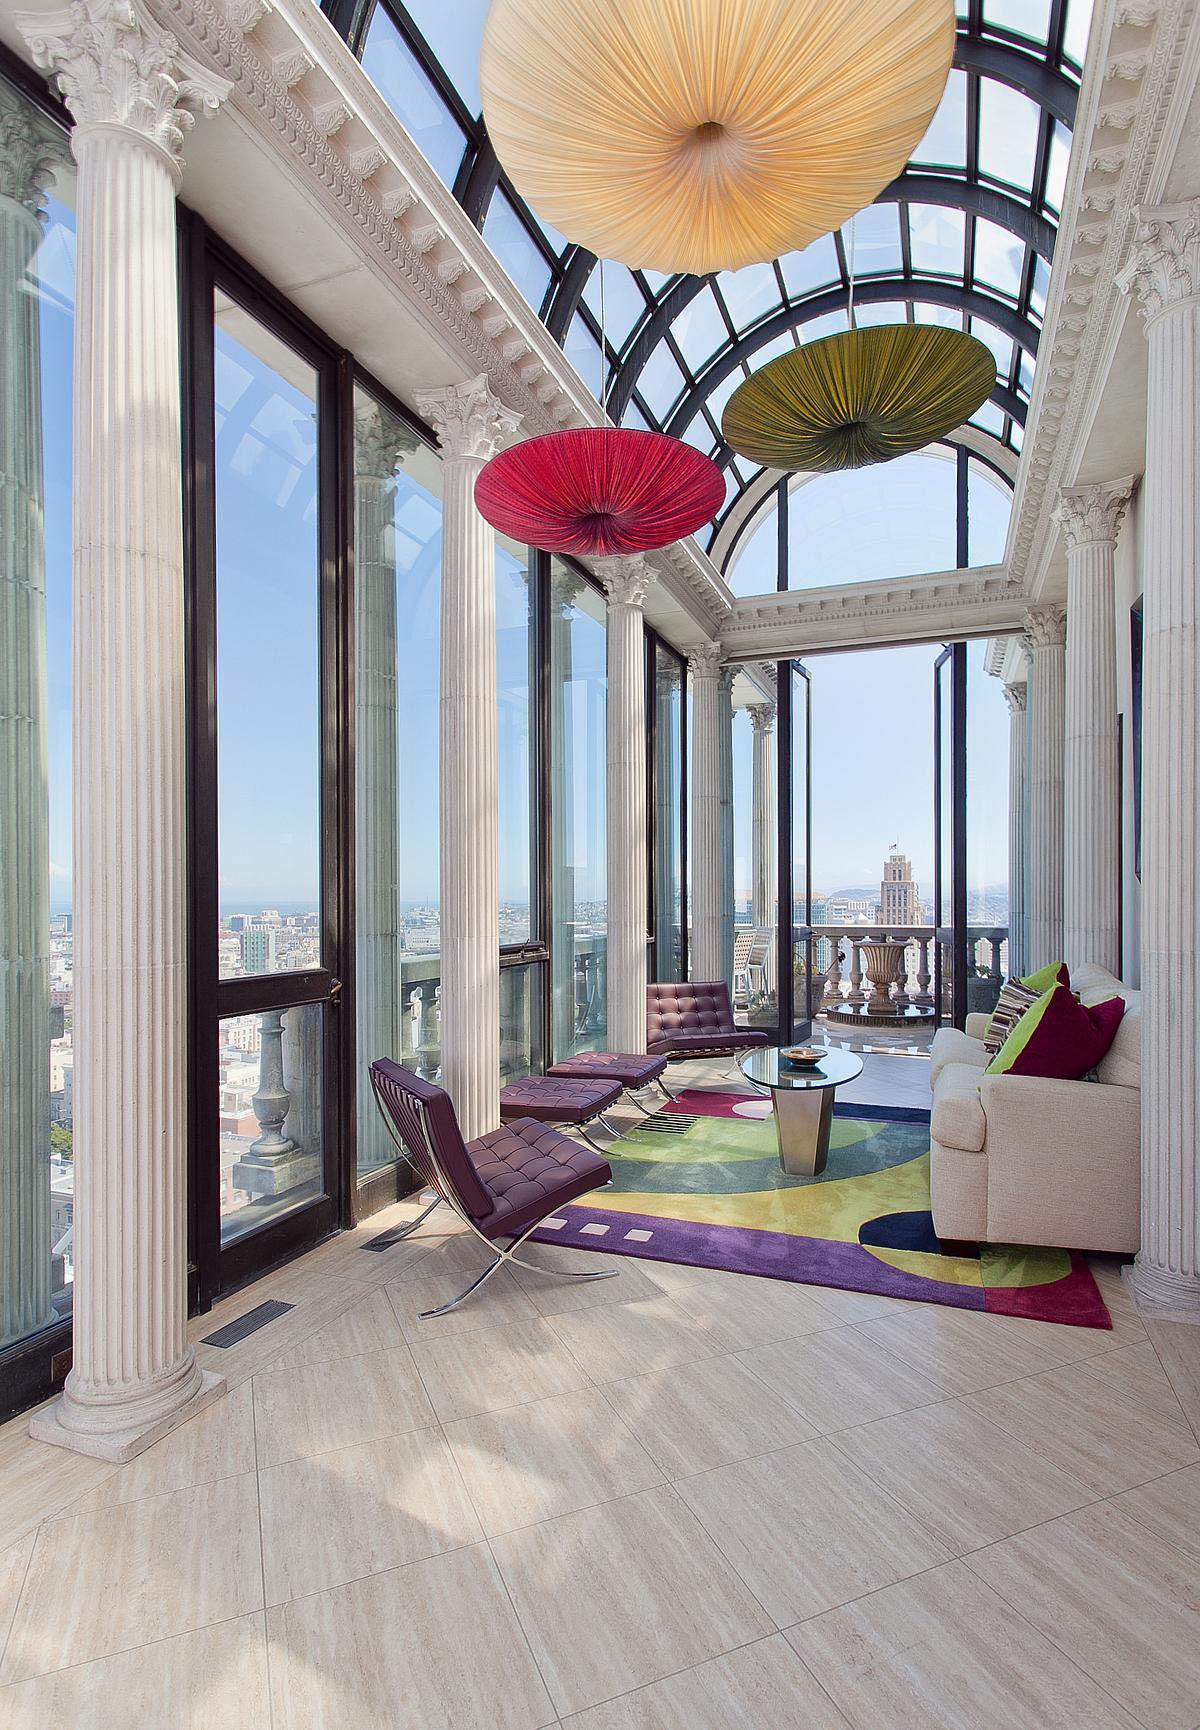 Exquisite Penthouse Atop The Art Deco Hamilton Building In San Francisco  iDesignArch